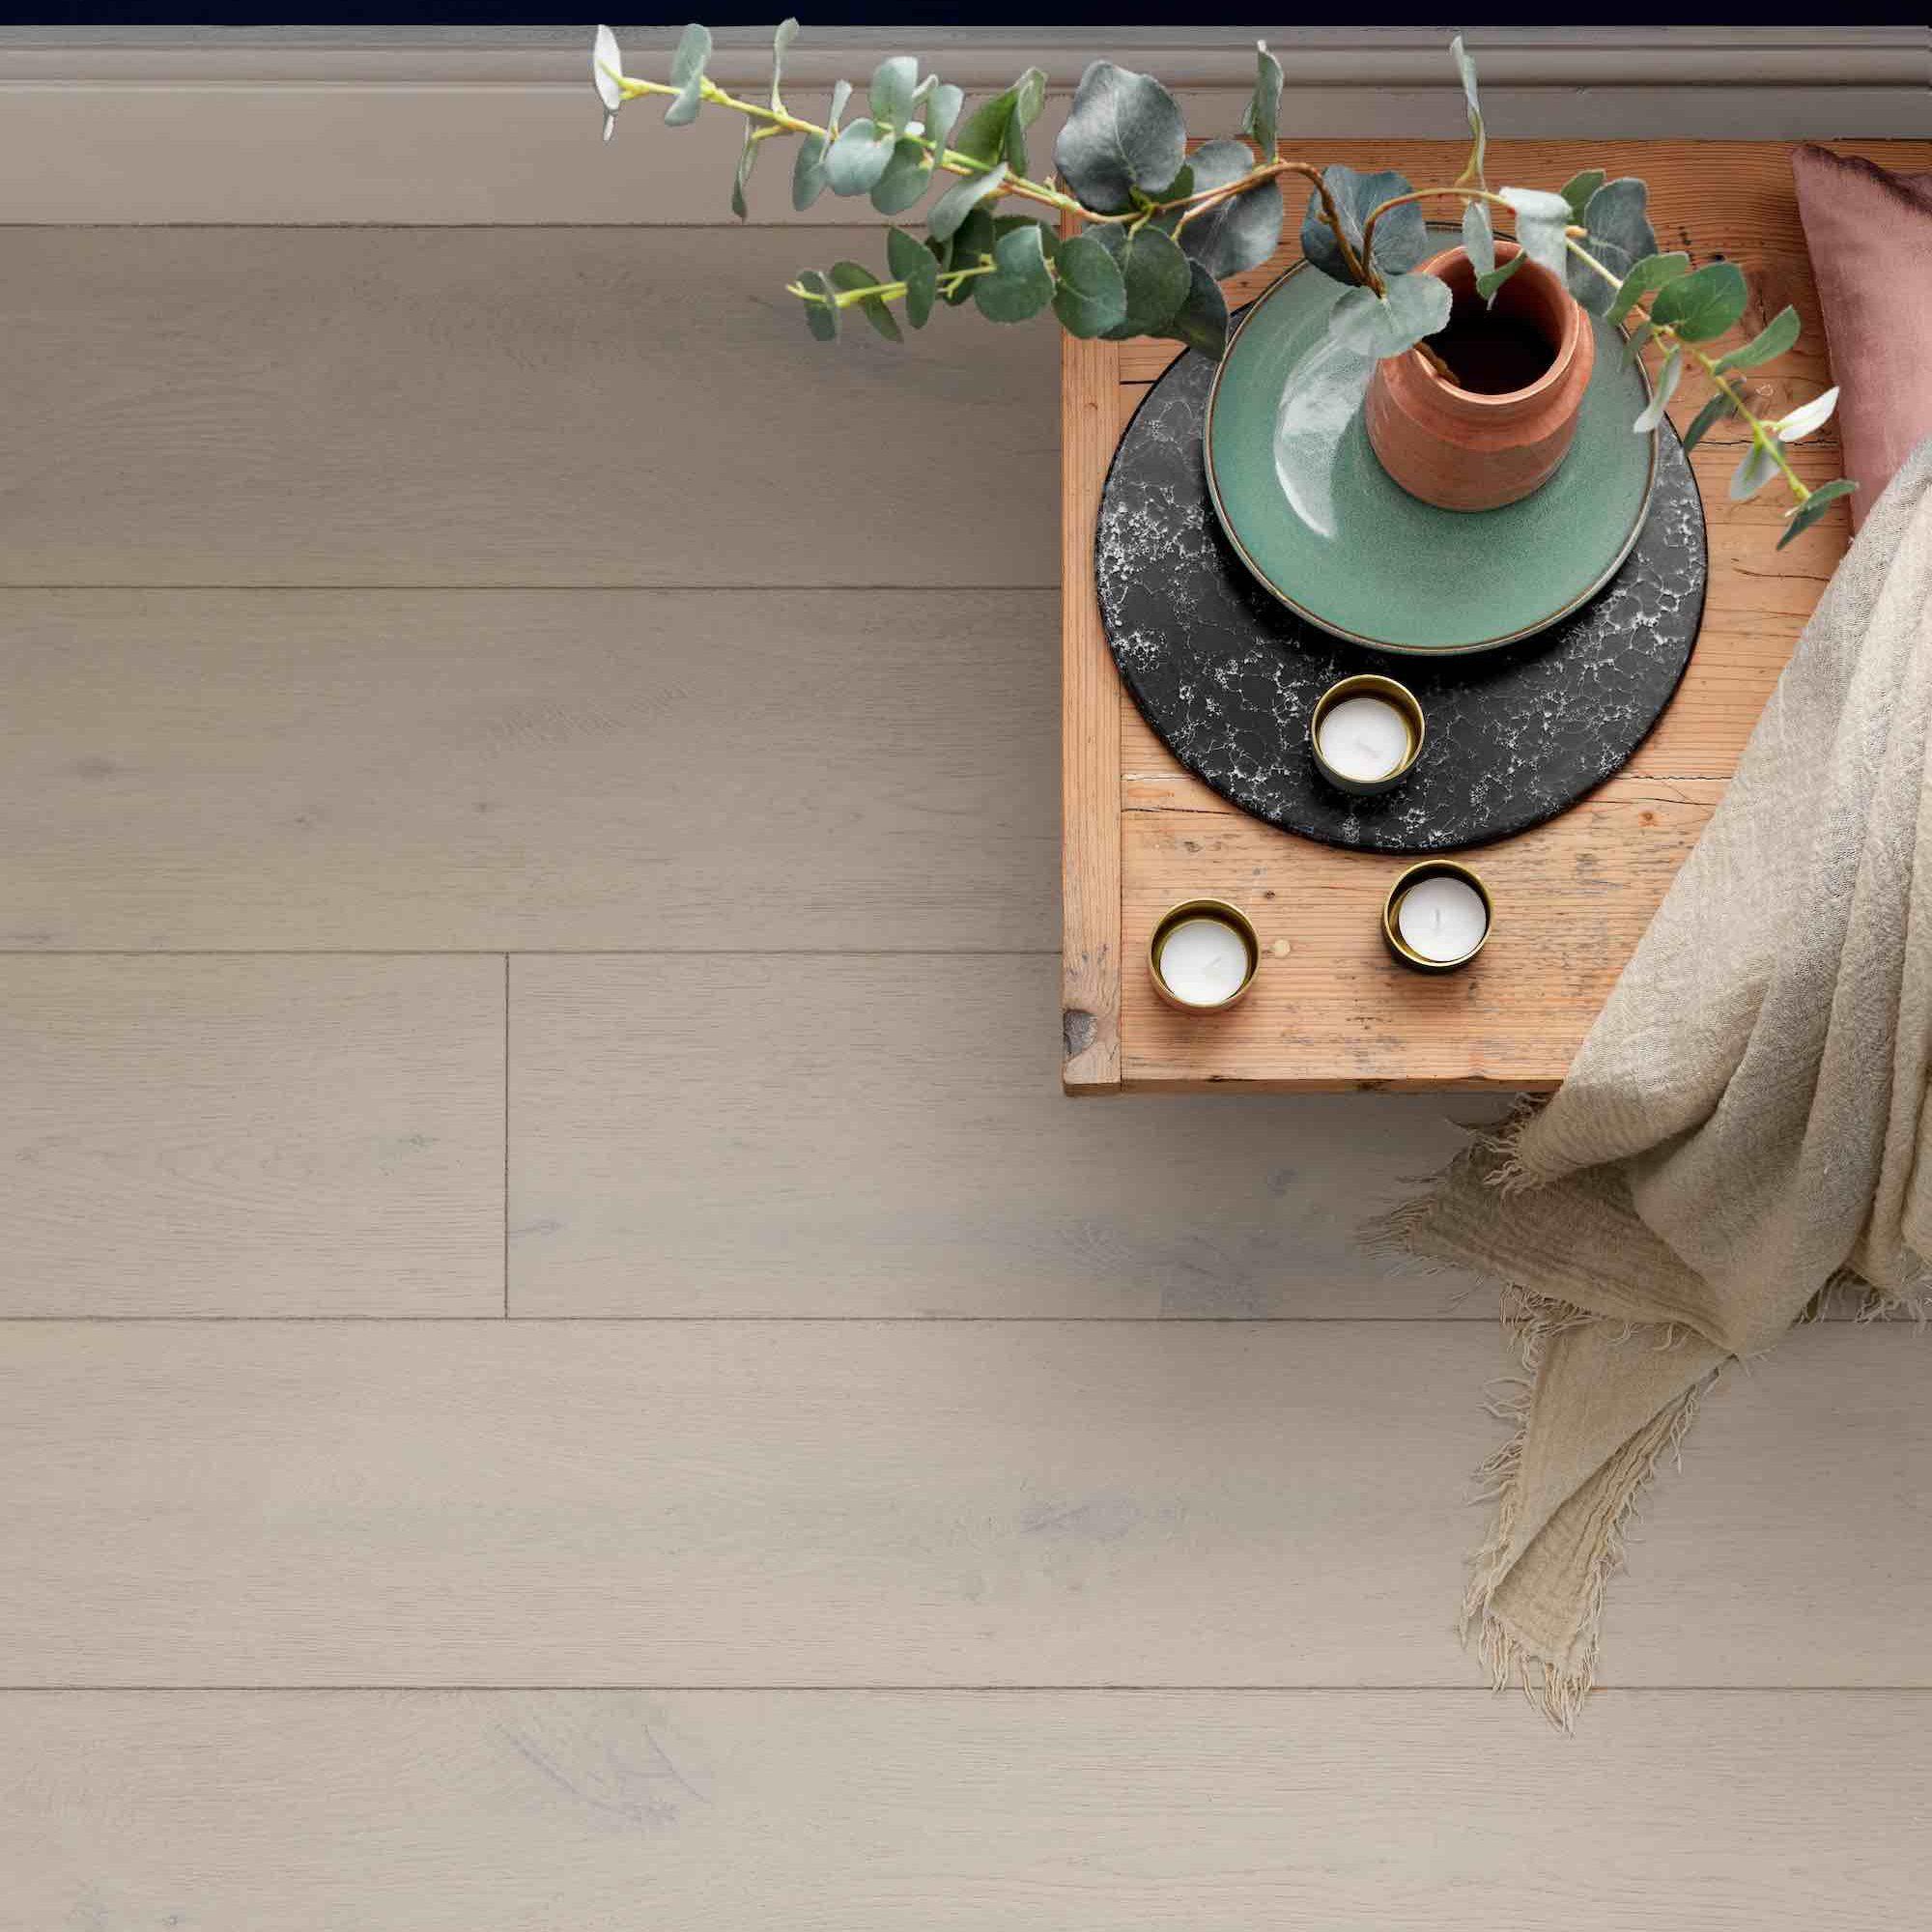 Engineered hardwood flooring in wide planks and white tones